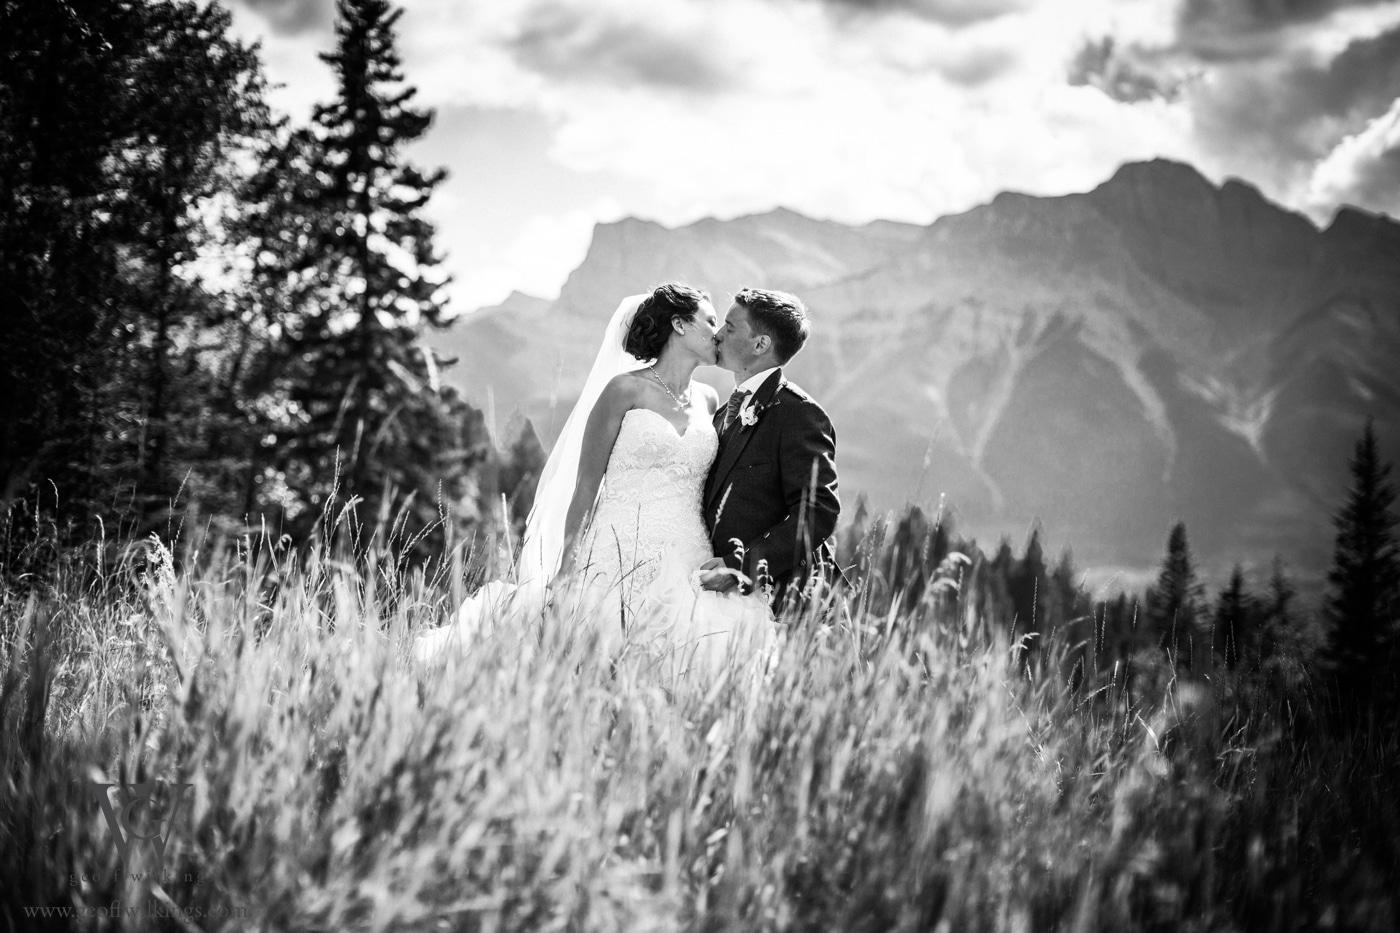 Silvertip wedding photos Calgary wedding photographers Geoff Wilkings Photography_019